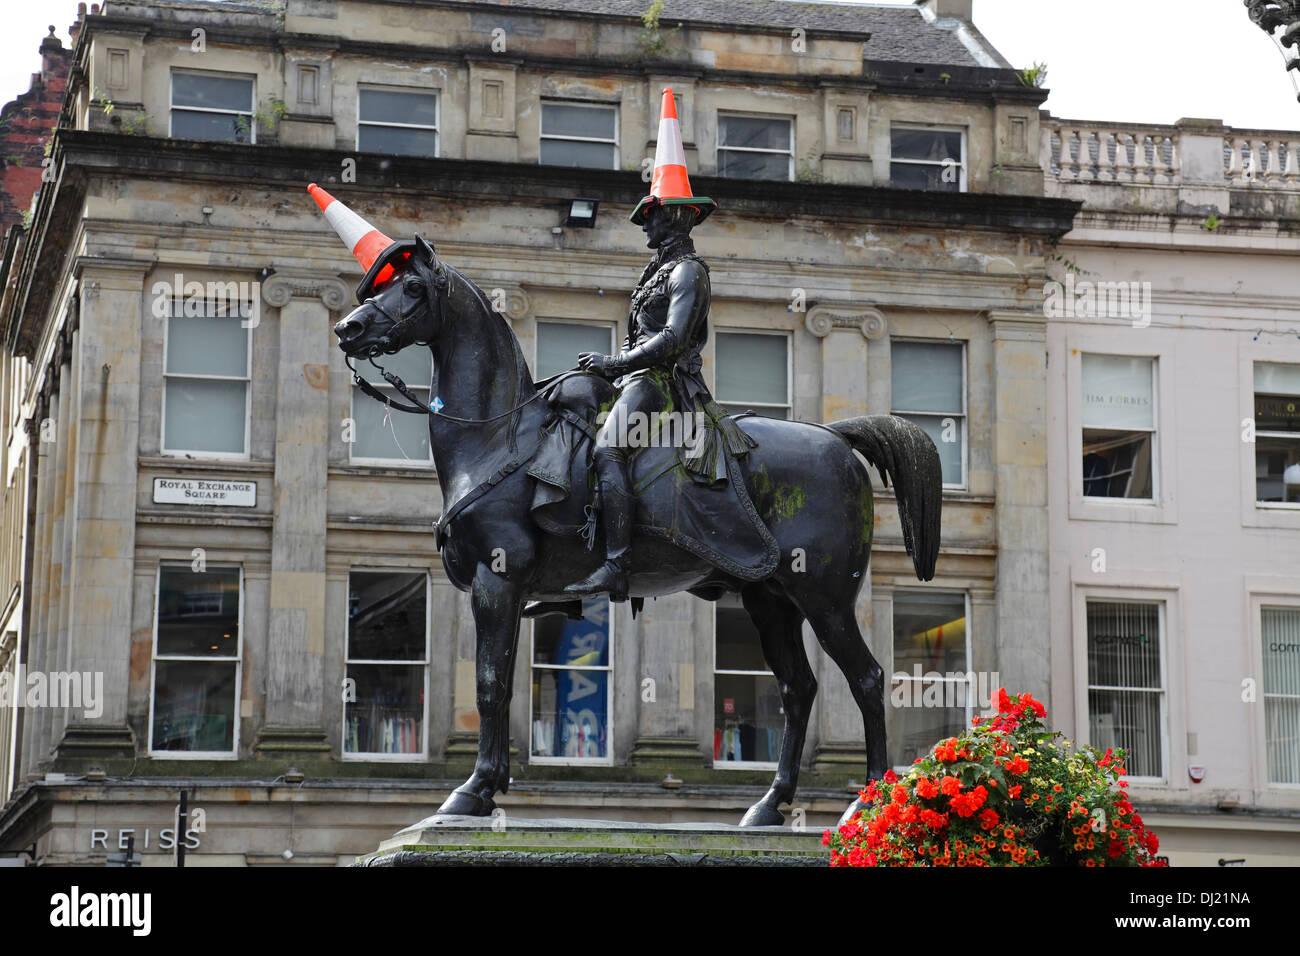 Duke of Wellington statue in Glasgow city centre, Scotland, UK - Stock Image